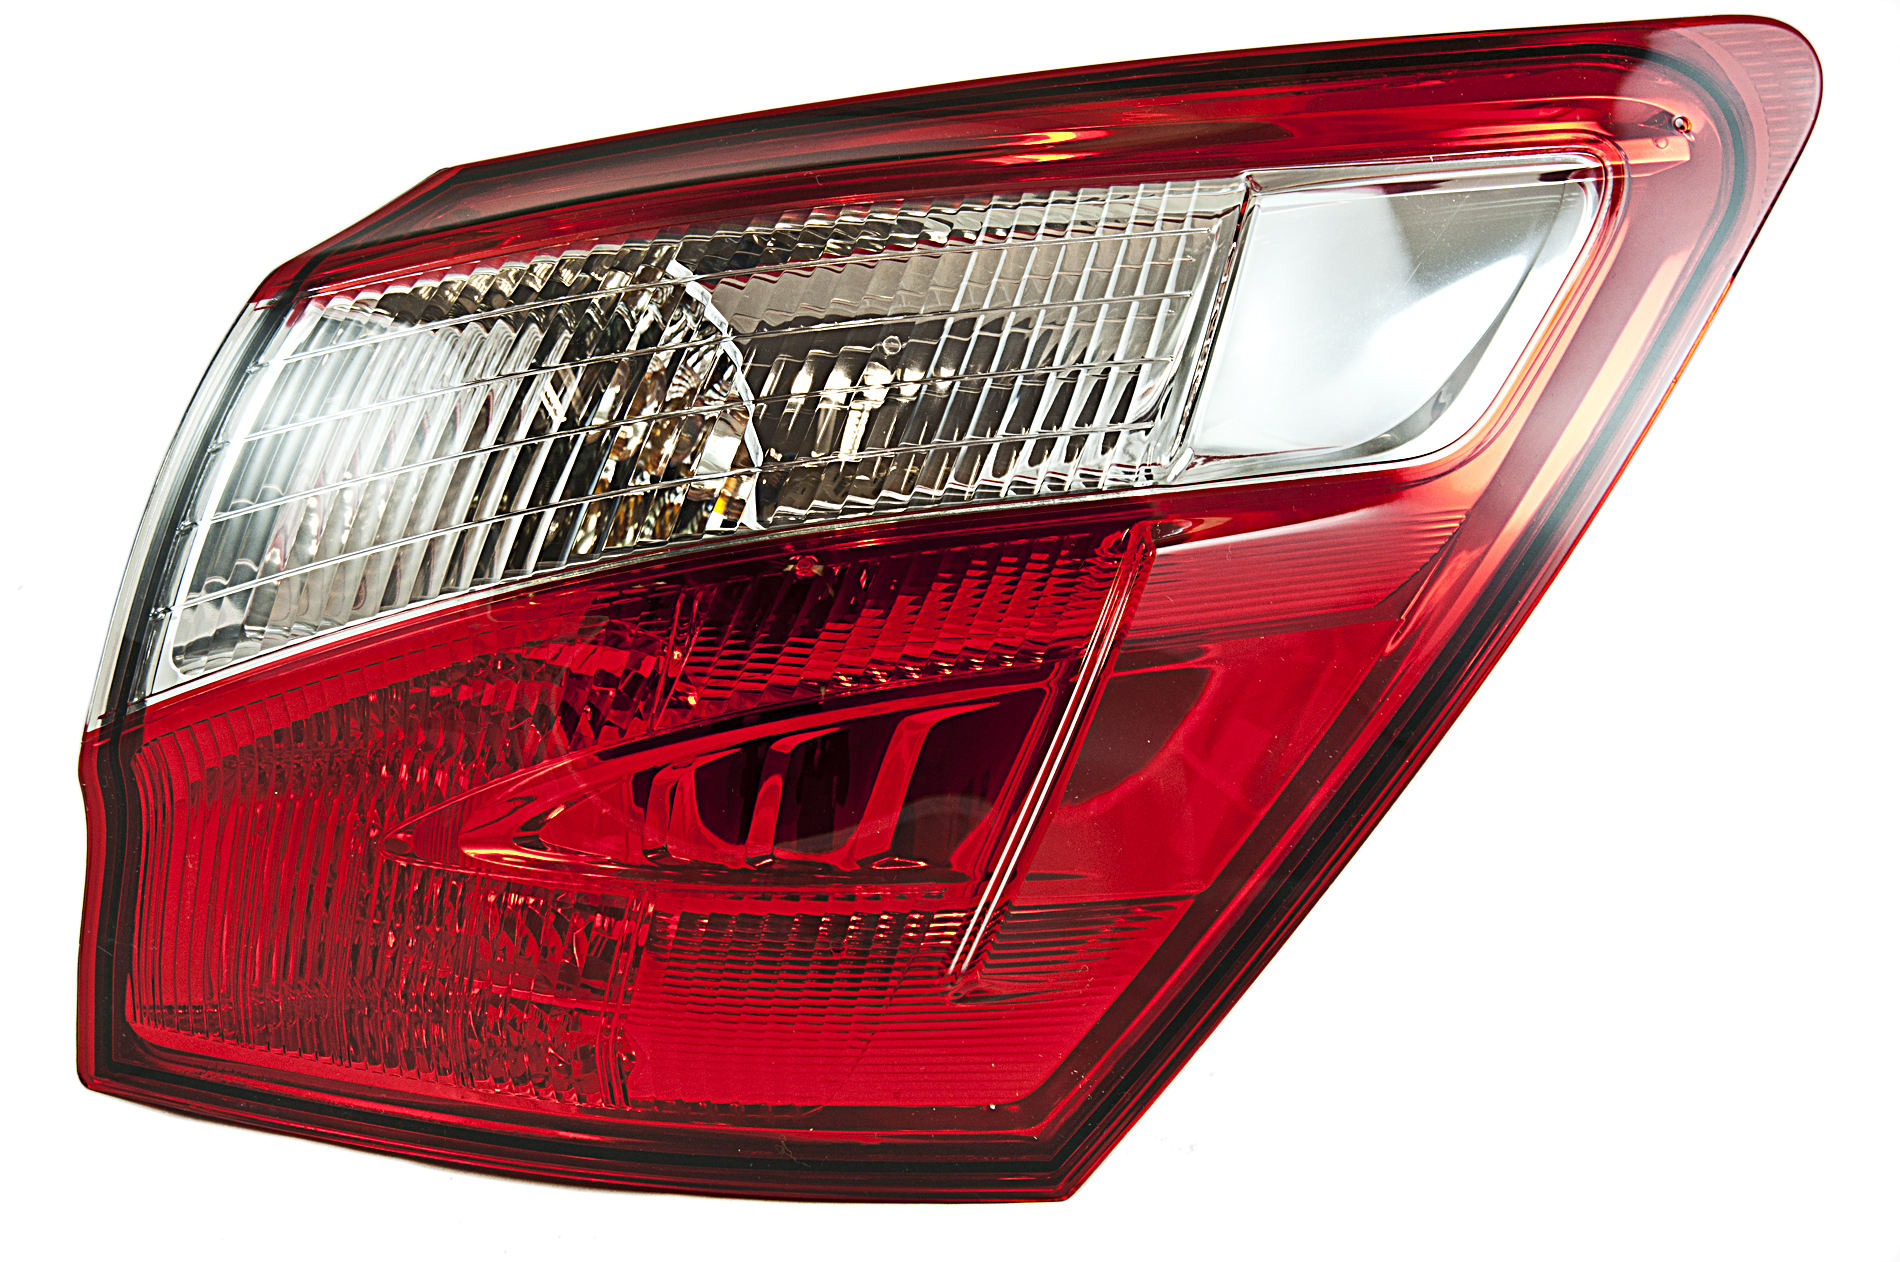 Nissan Genuine Tail Light Qashqai J10 Rear Lamp Right O S